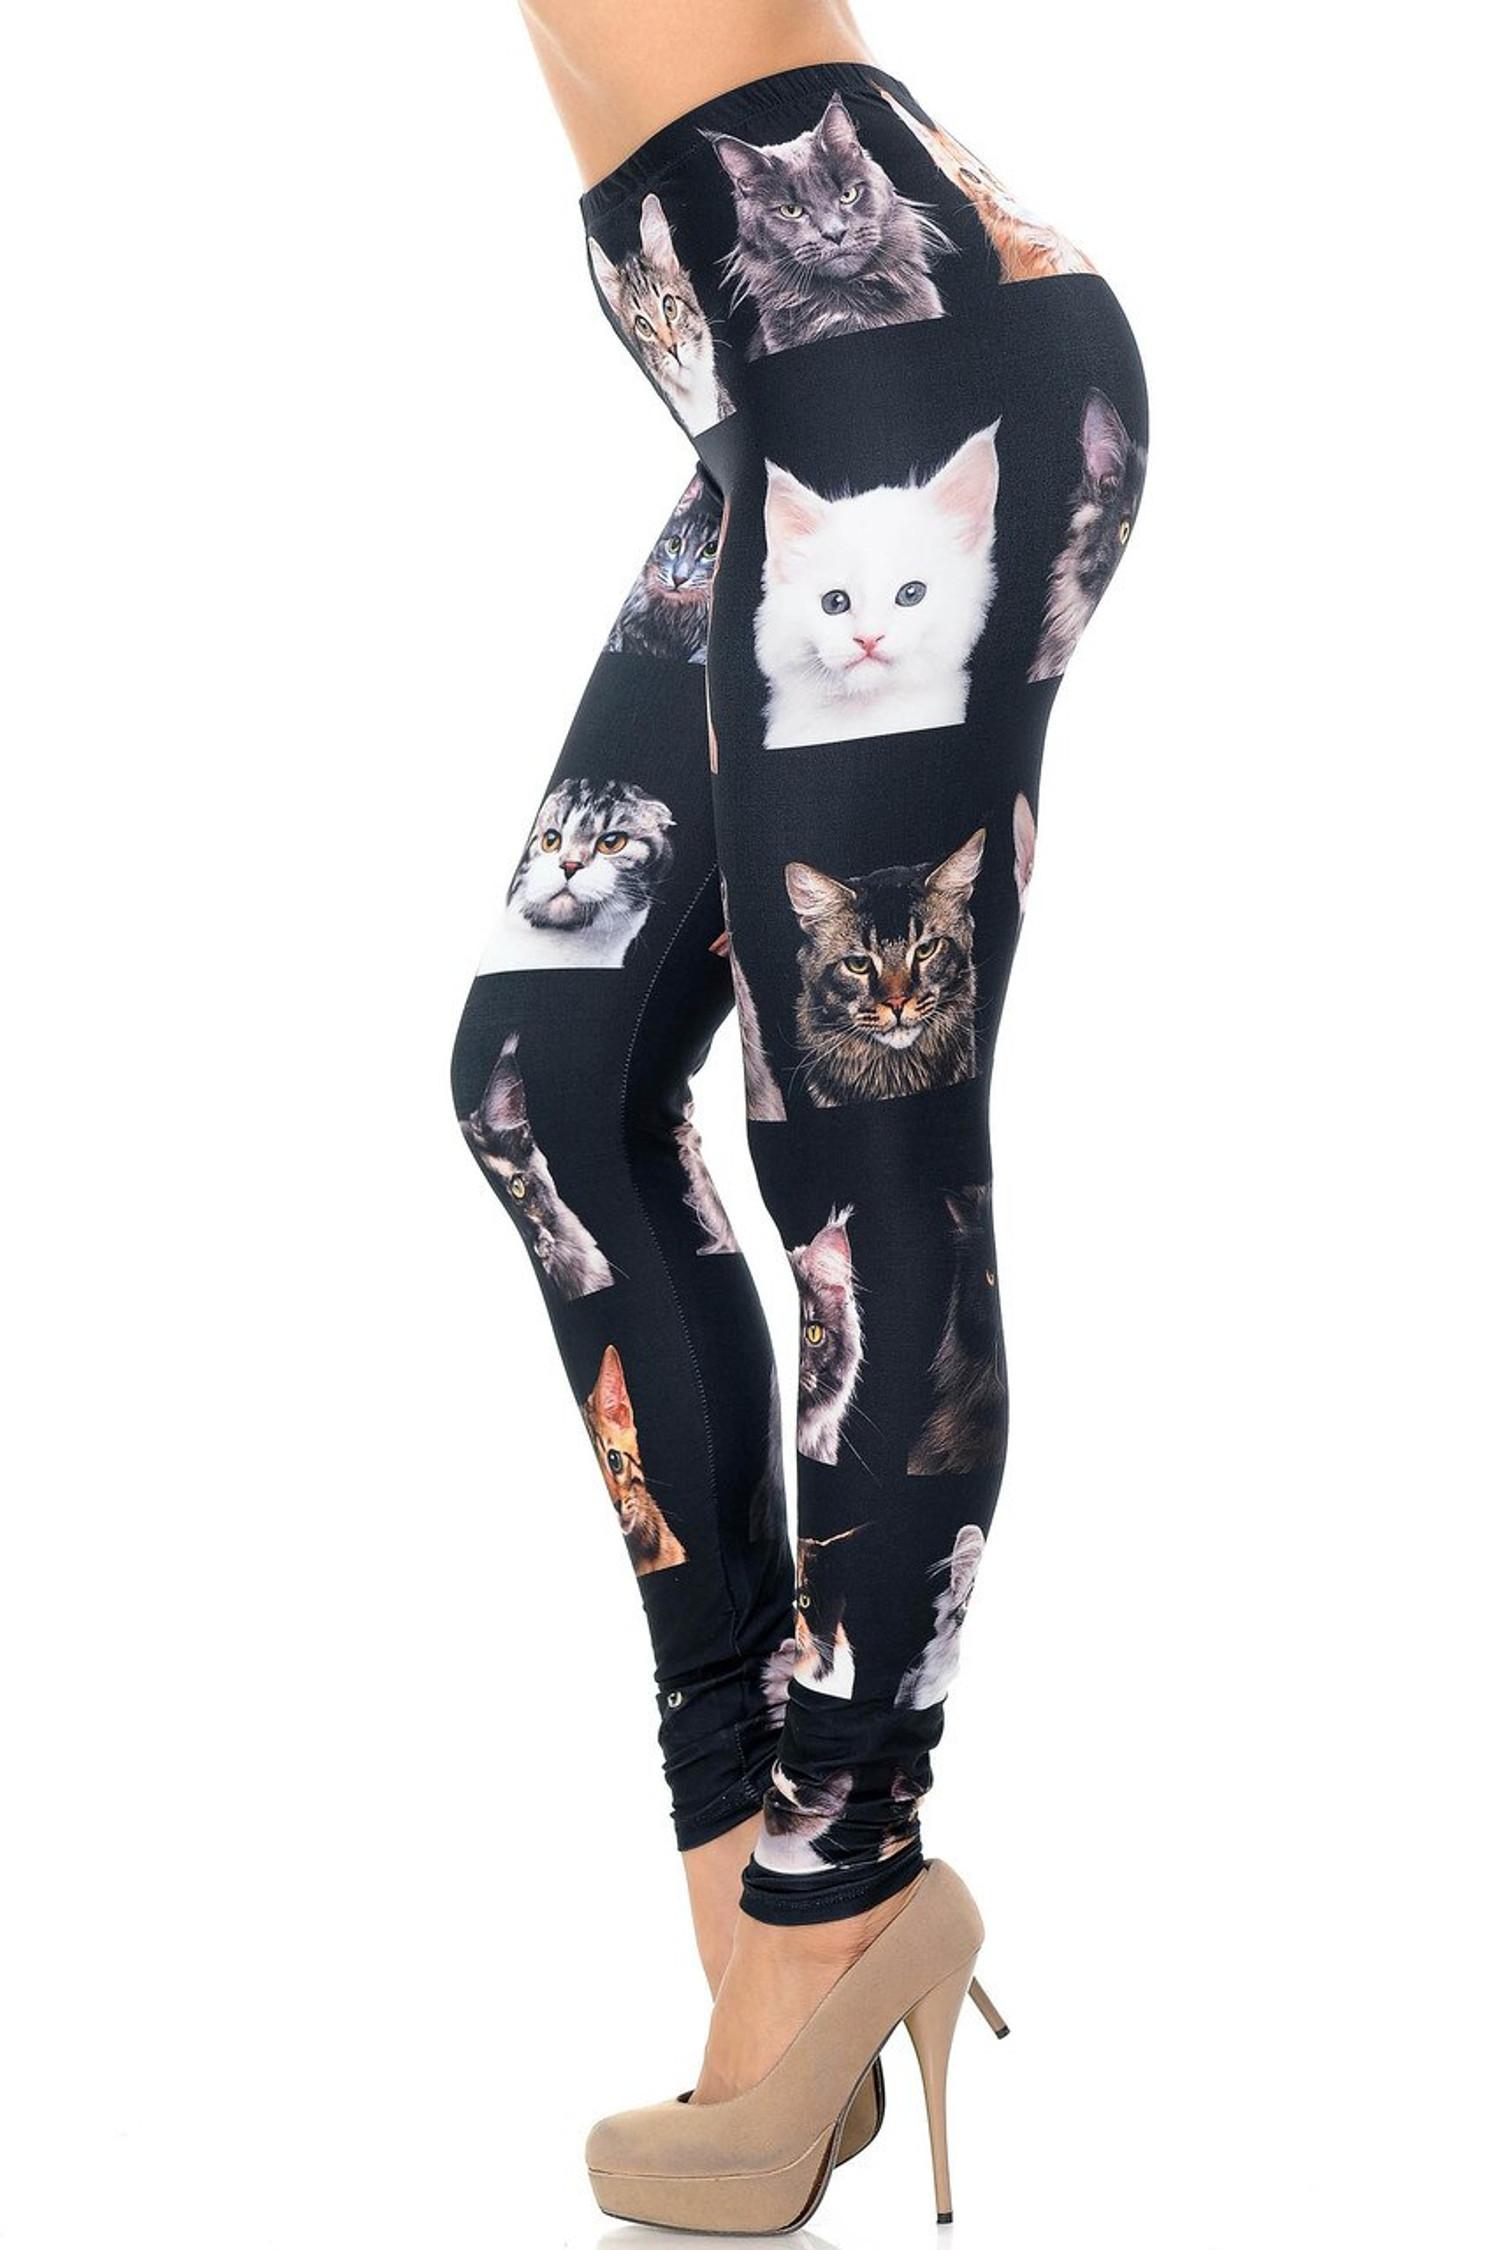 Creamy Soft Cute Cat Faces Leggings - Version 2 - USA Fashion™